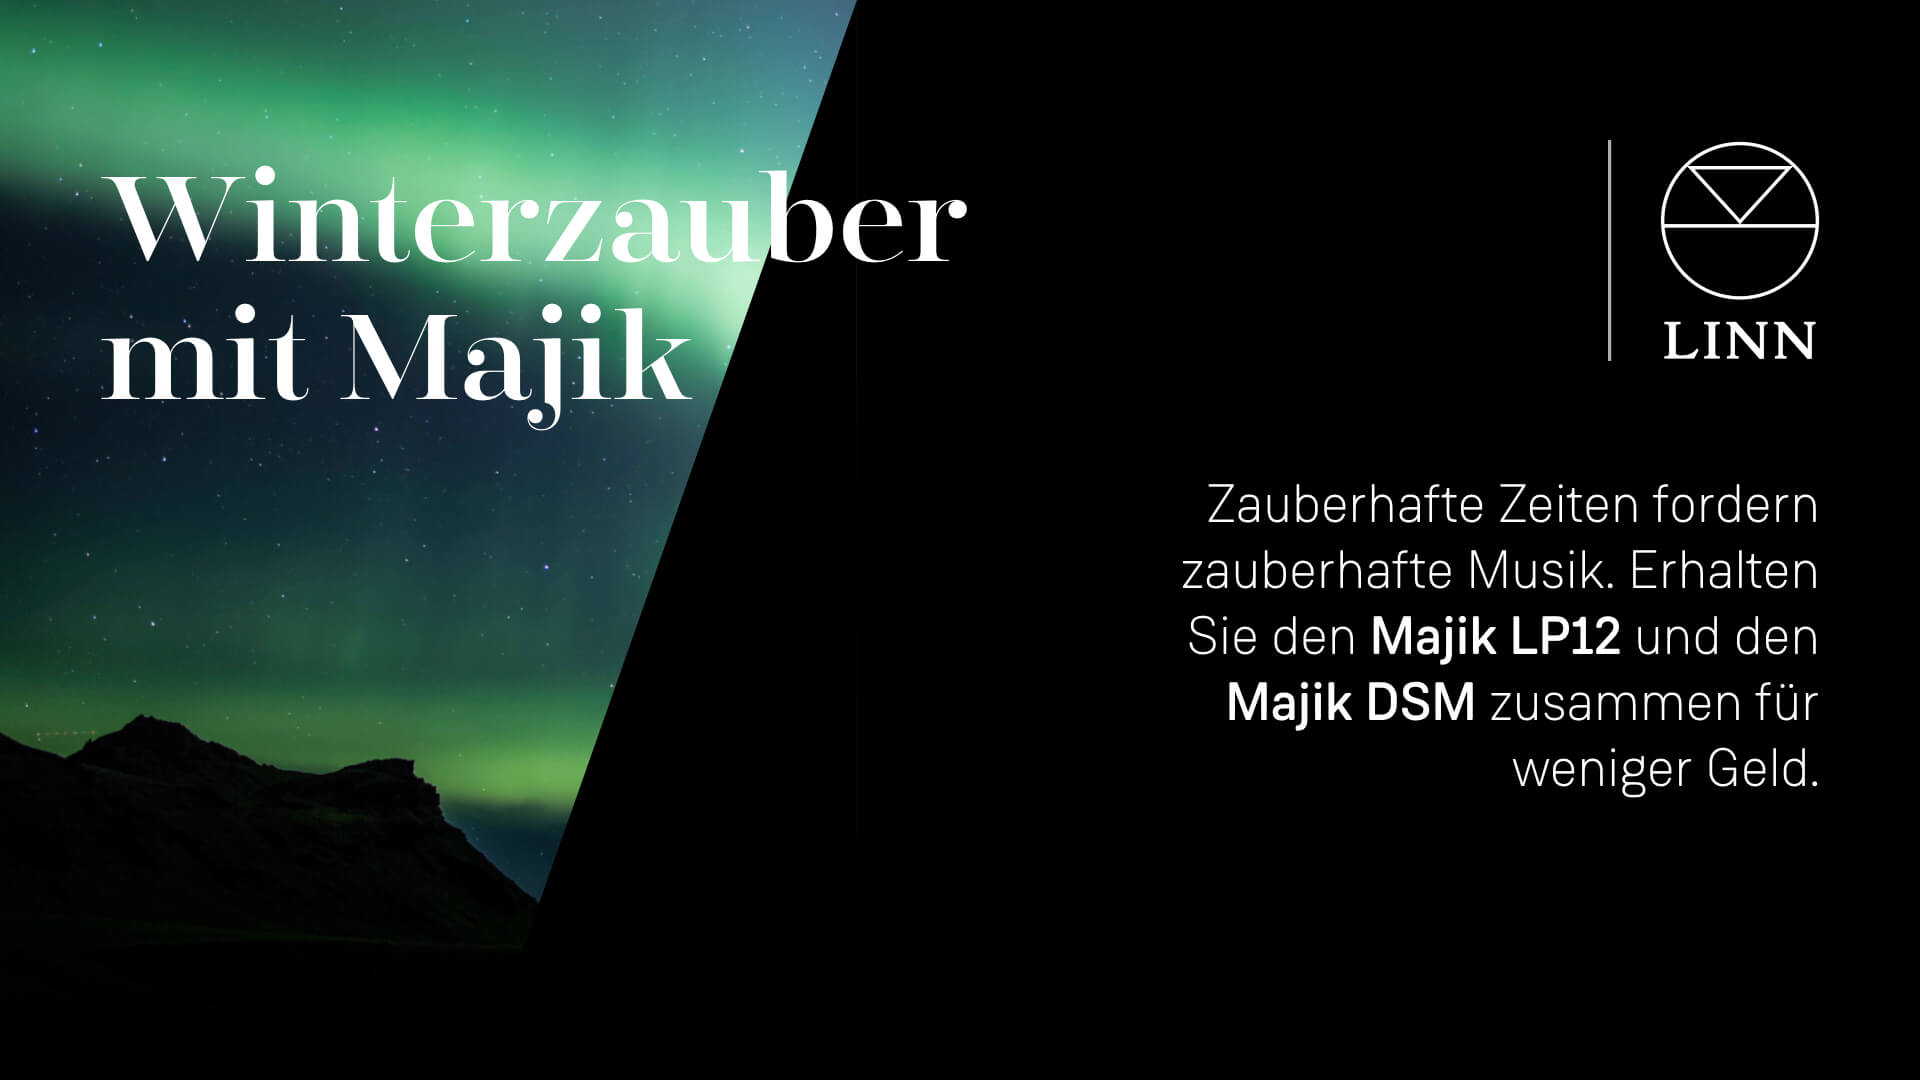 WP18 Web banner 1920x1080 Co branded DE - Linn Weihnachtsangebot 2018, Linn Majik DSM + Majik LP12